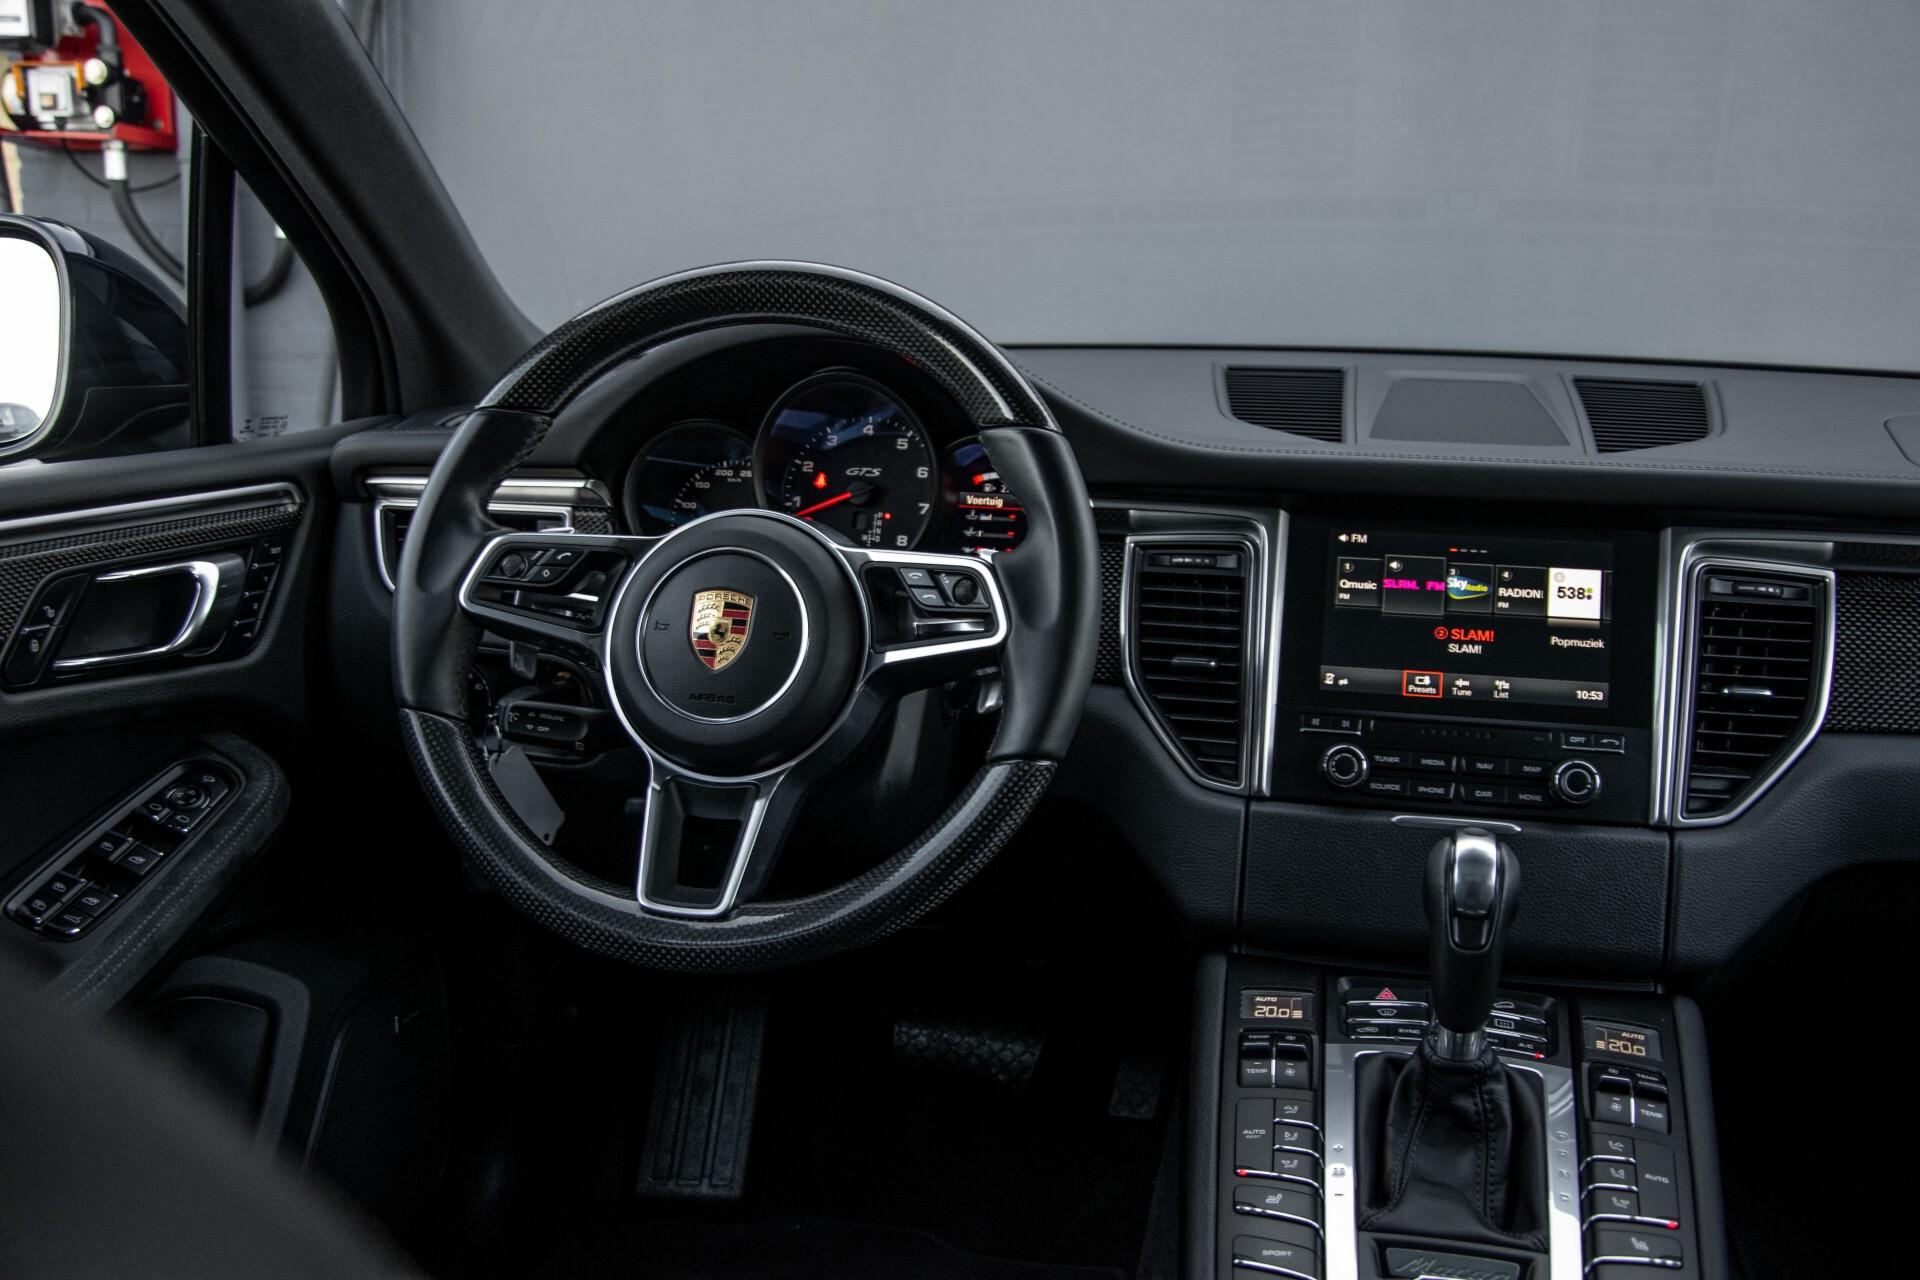 Porsche Macan 3.0 GTS Luchtvering/Panorama/Carbon/Bose/360-camera/Memory/PDLS Aut7 Foto 7